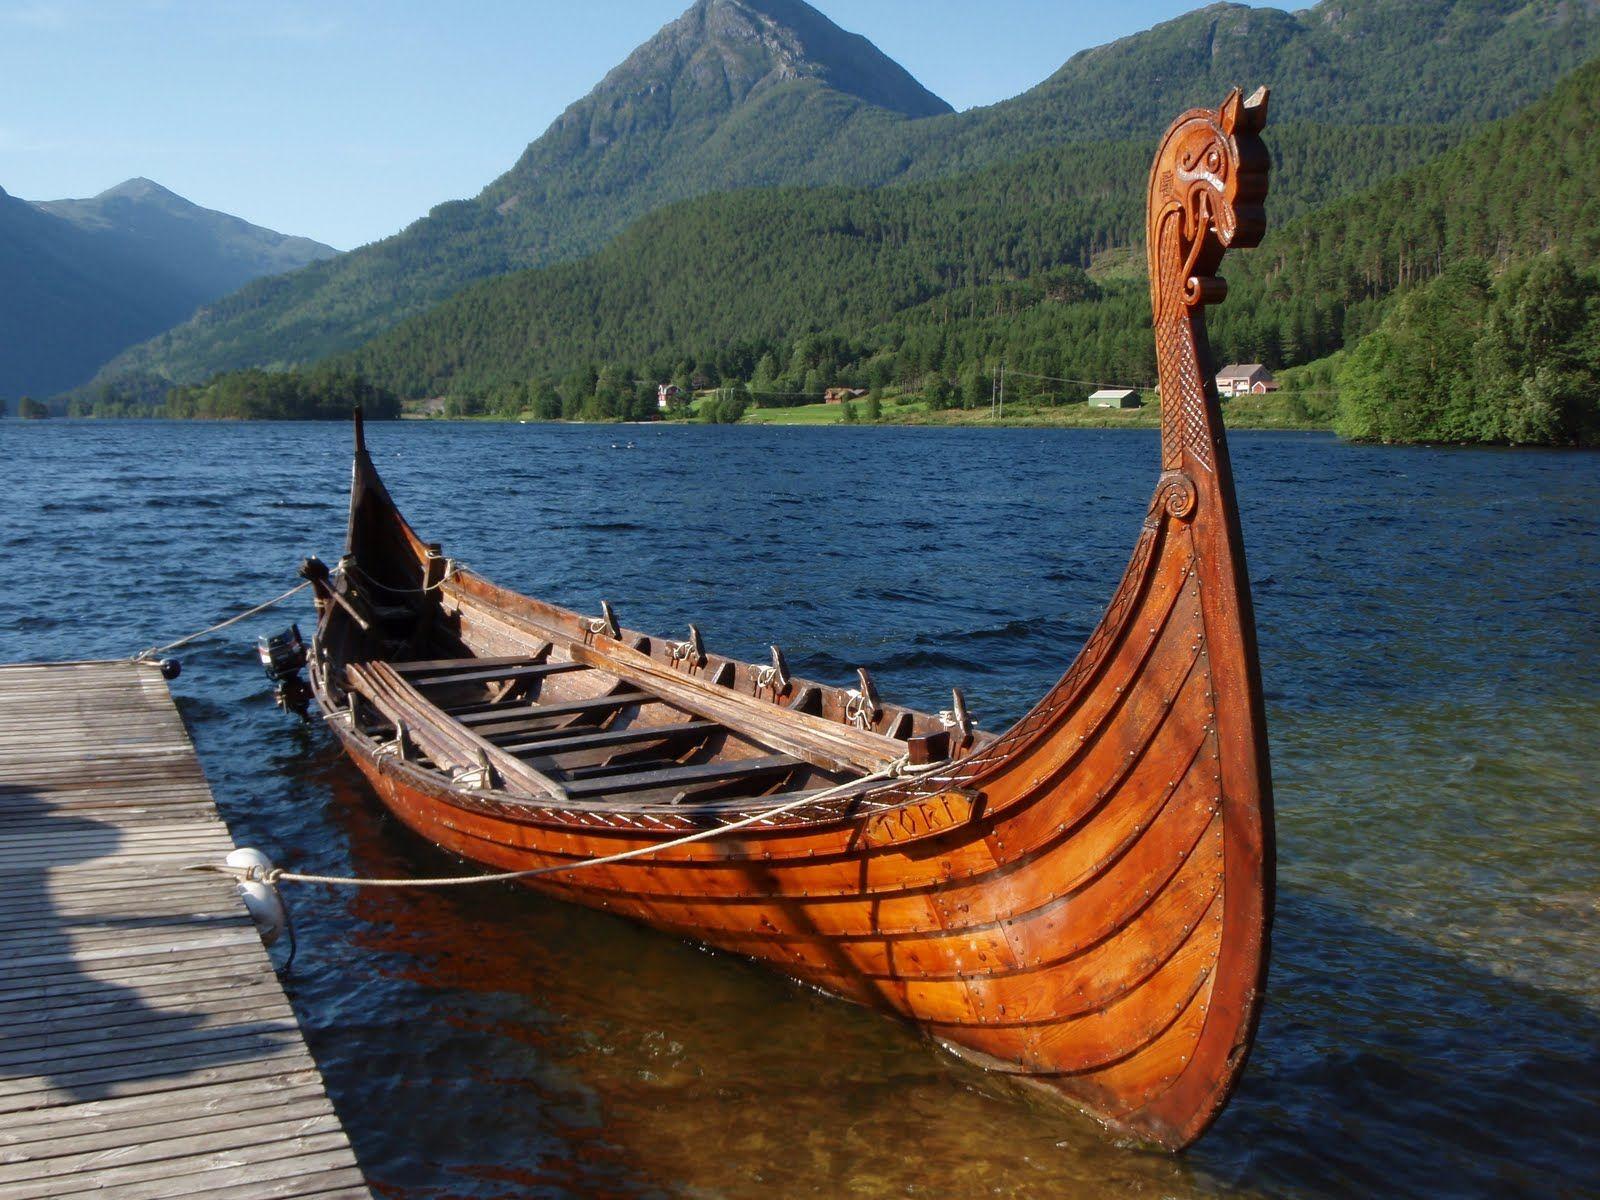 картинки лодка викингов суетой дня